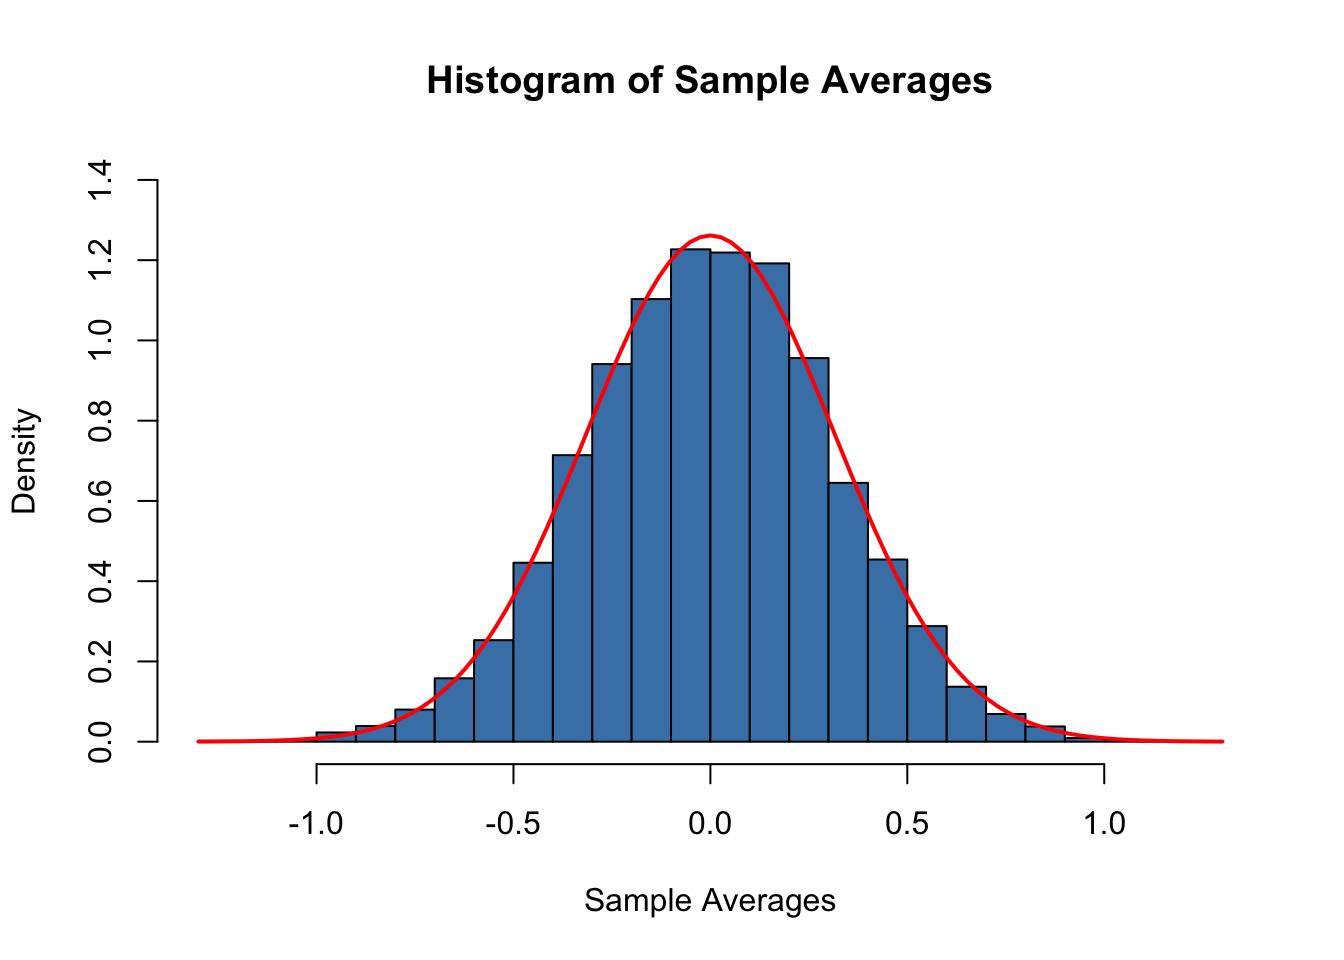 2 2 Random Sampling and the Distribution of Sample Averages